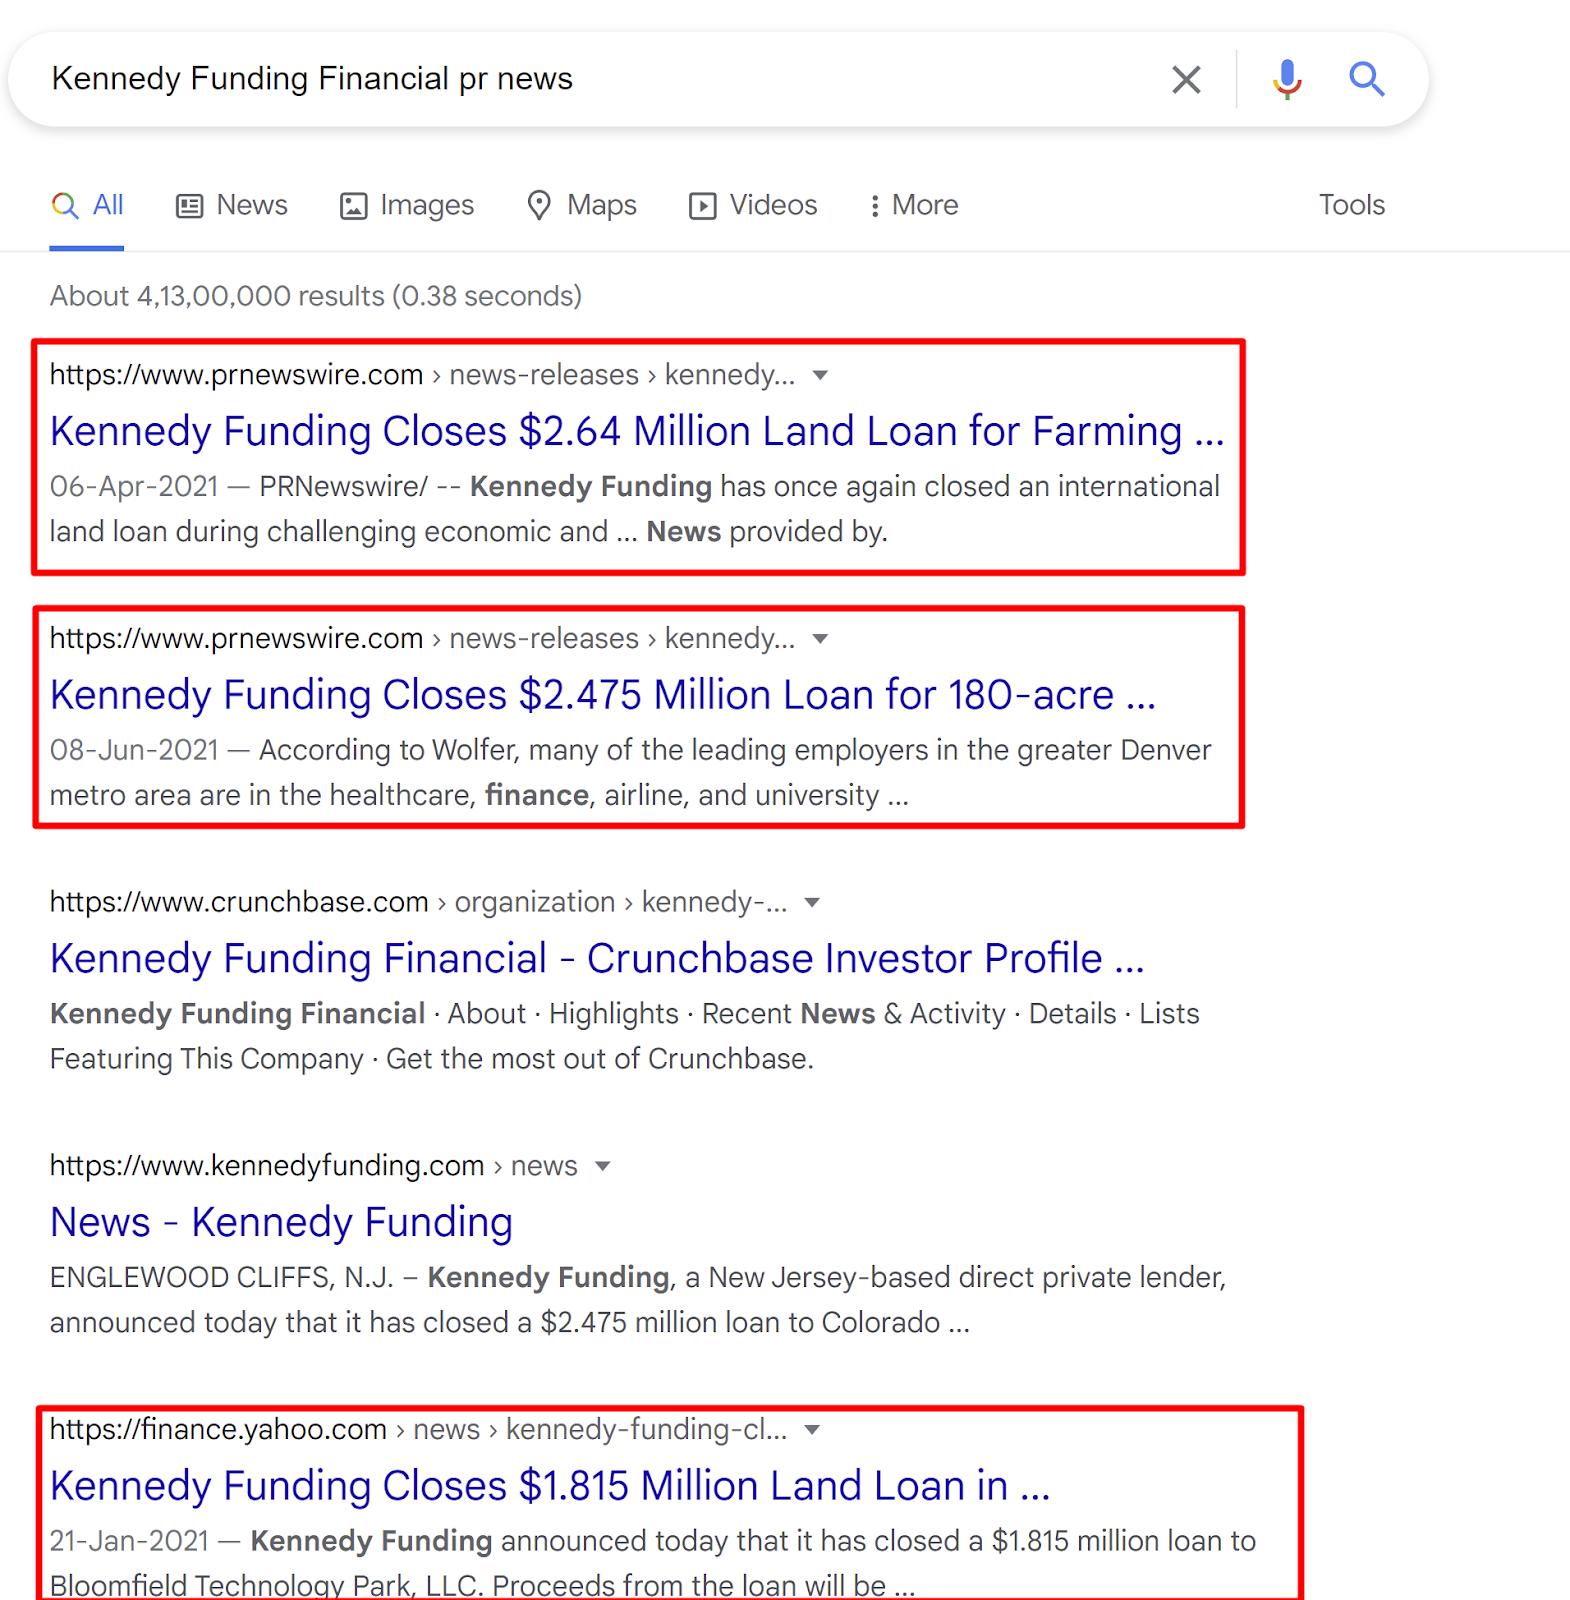 Kennedy Funding Financial news